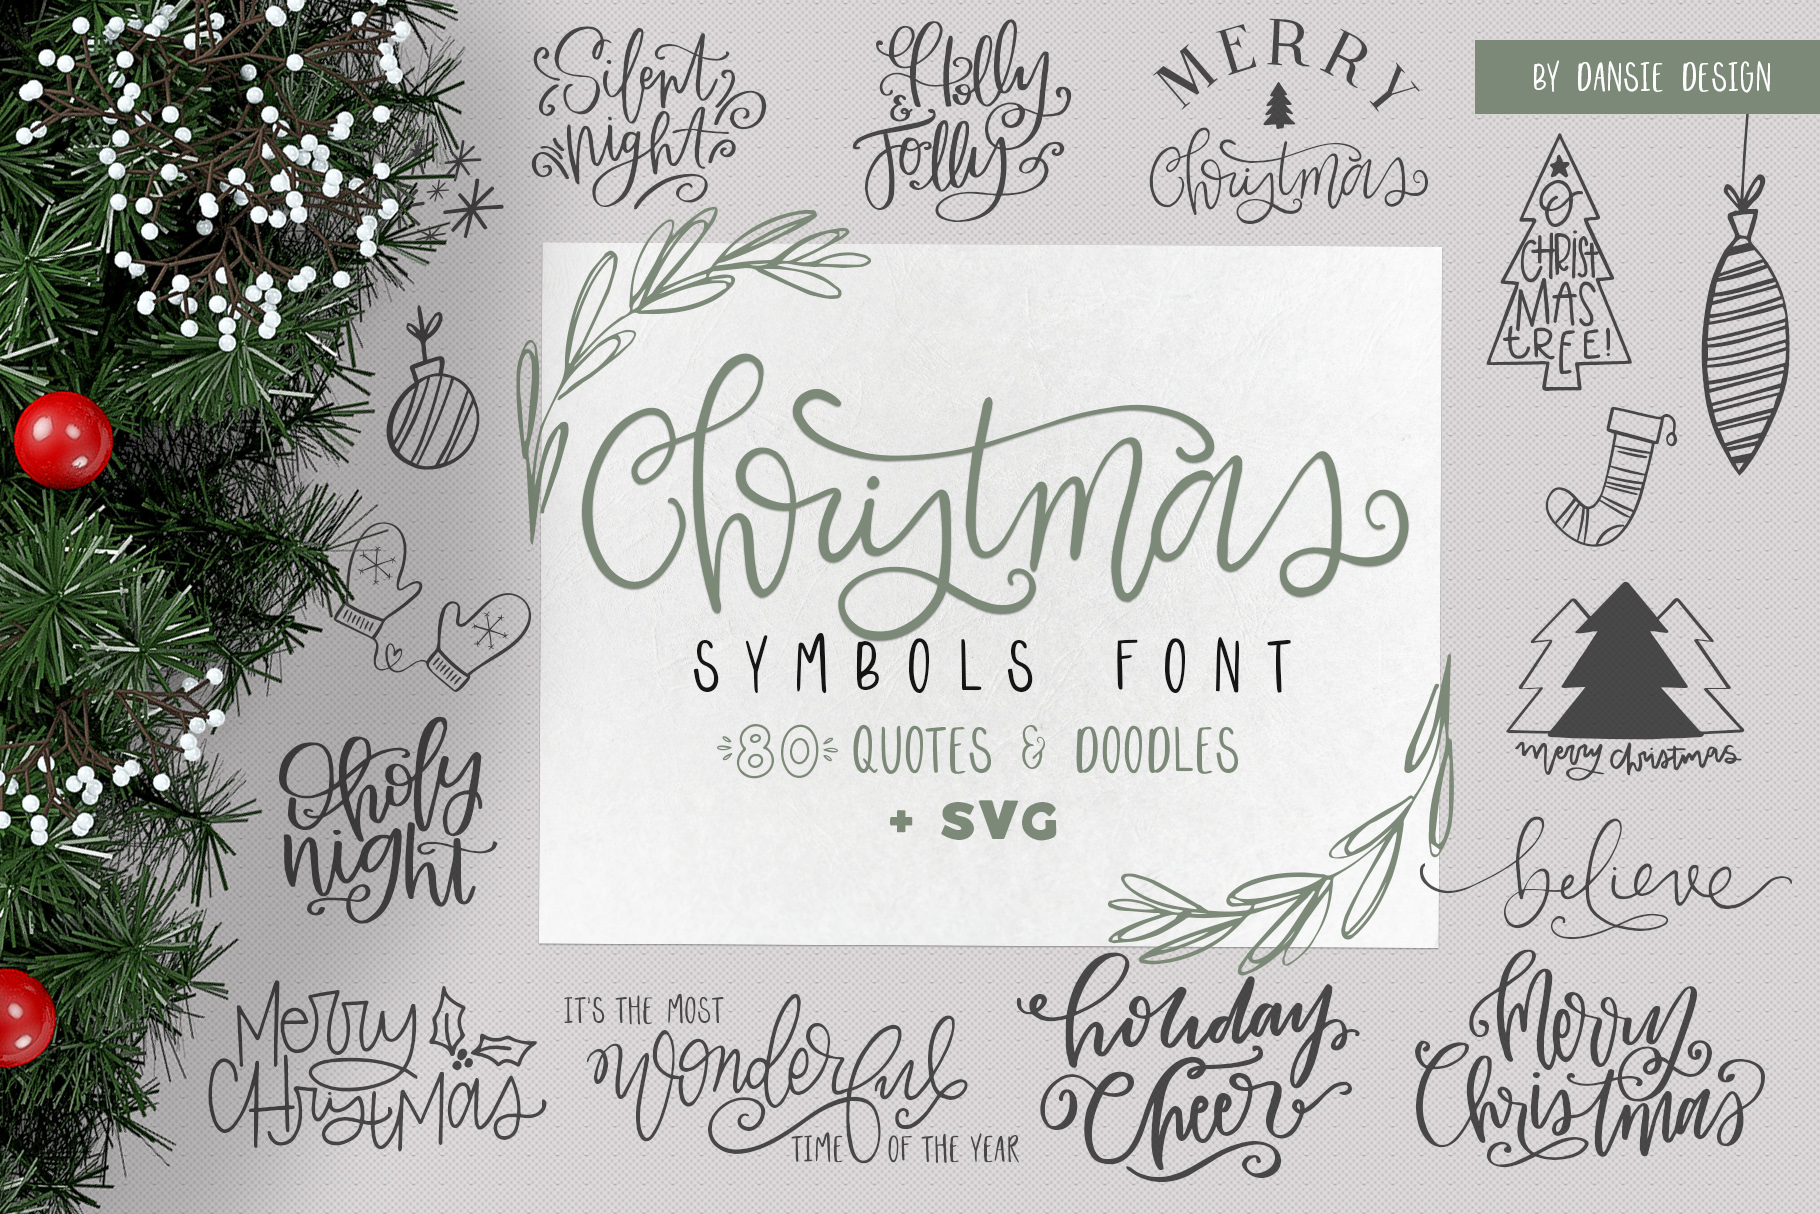 Christmas Symbols Font - Volume 2 example image 1